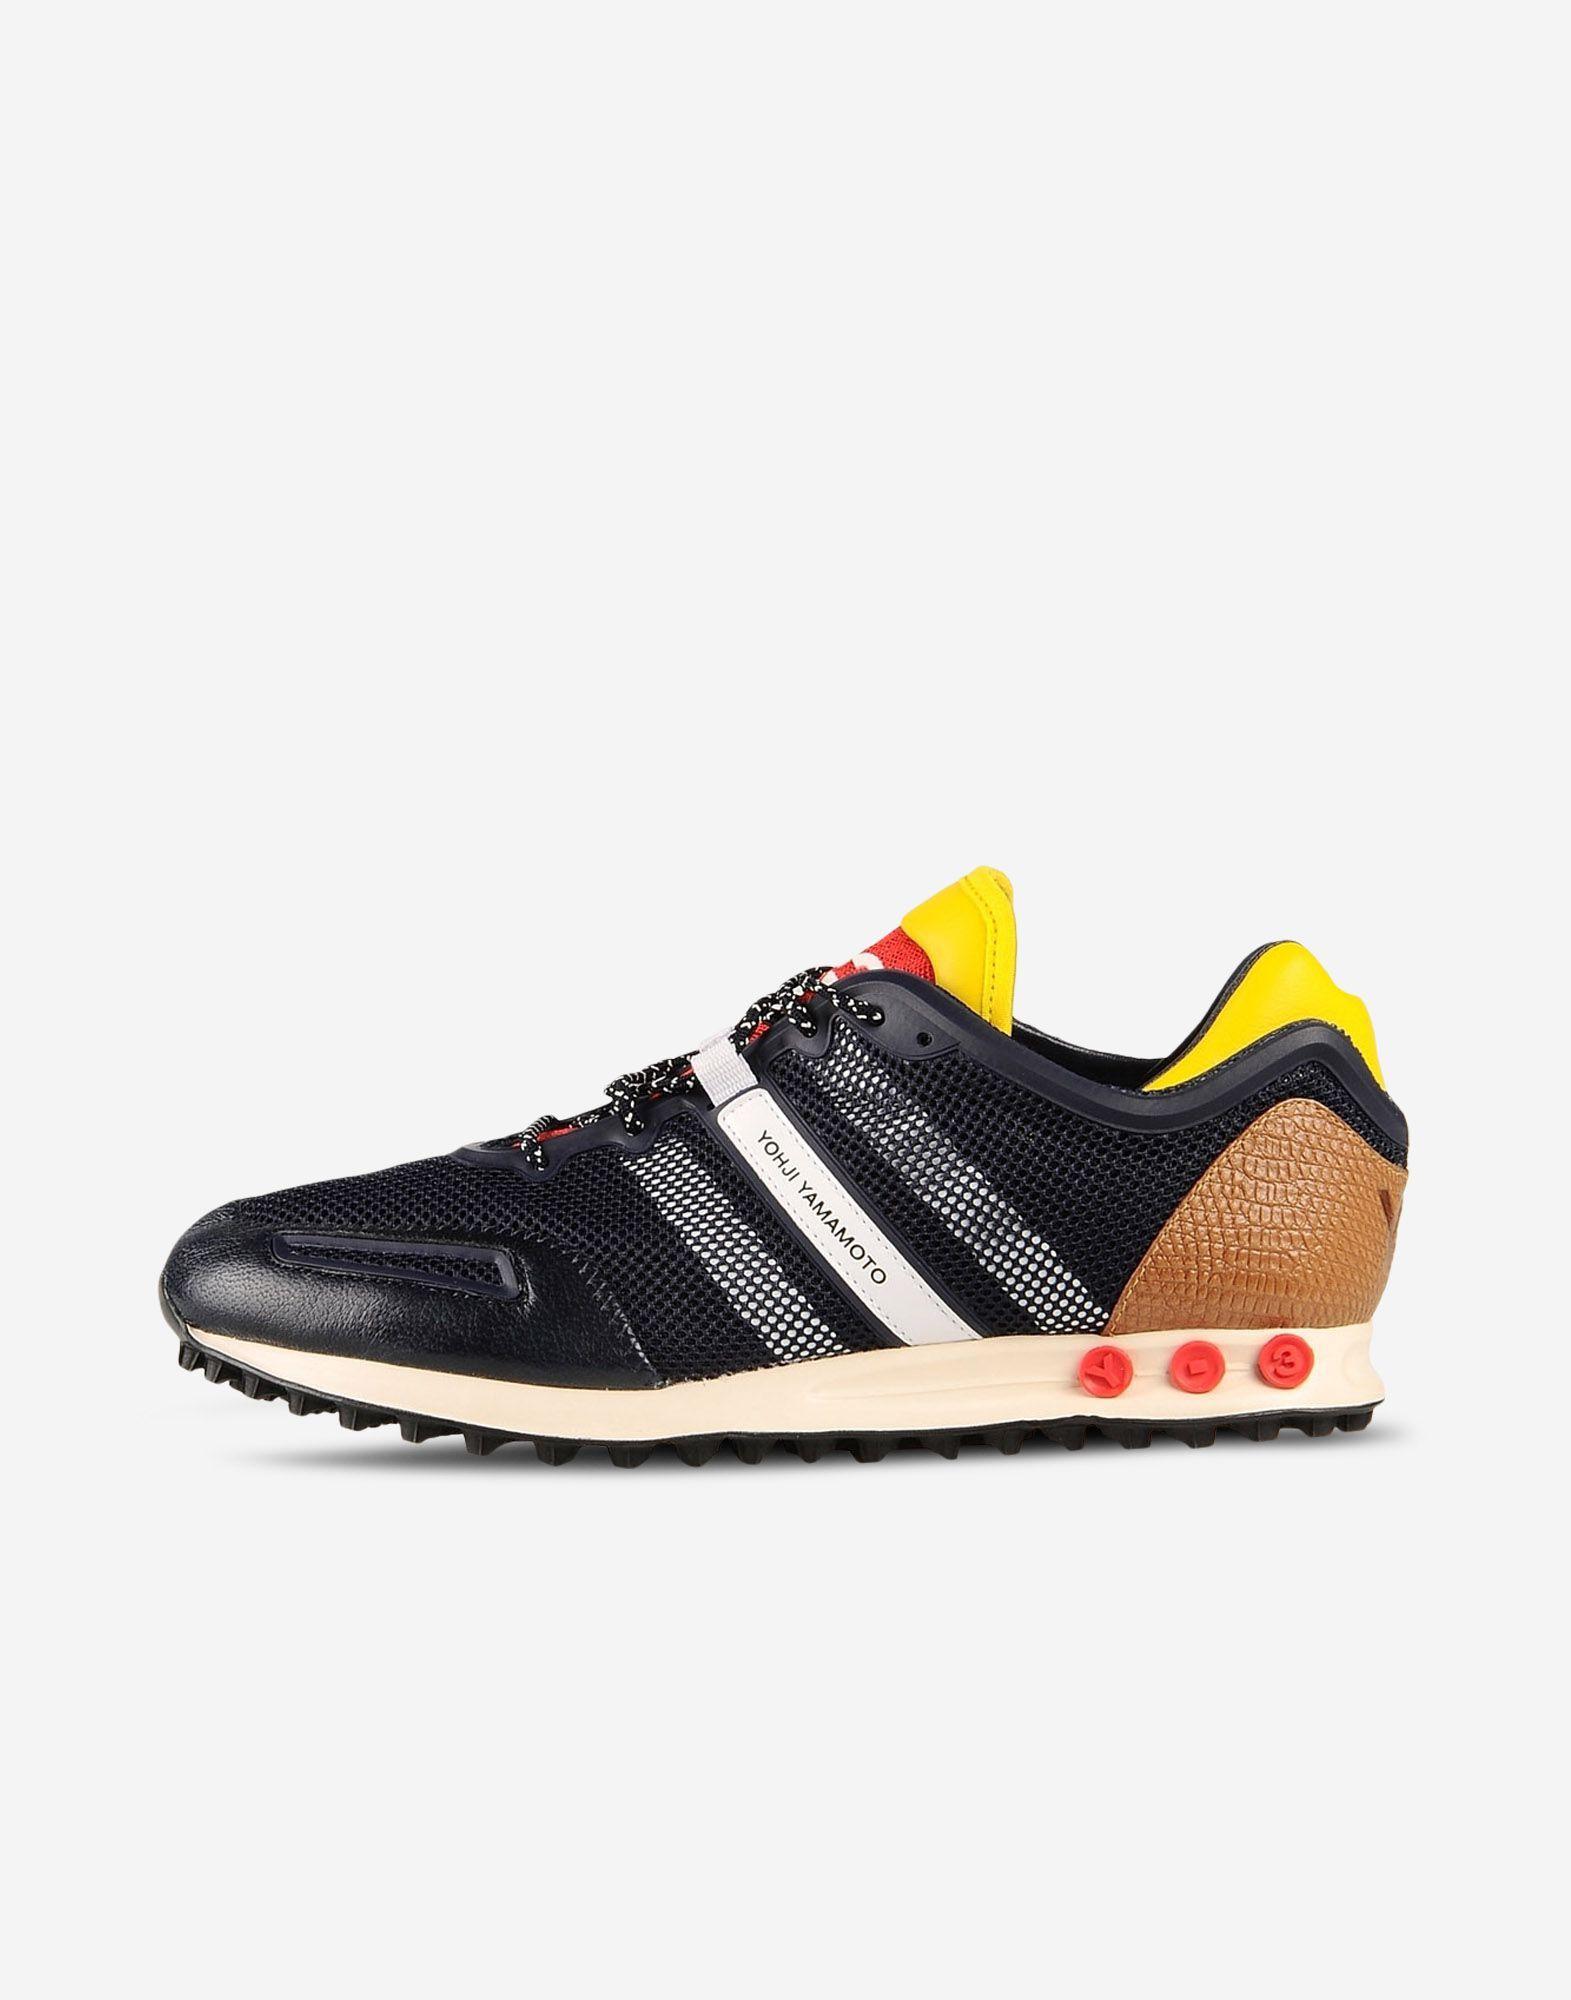 Y-3 Online Store, Y-3 Tokio Trainer - Sneakers   Shoes   Pinterest ... f51130d47b6